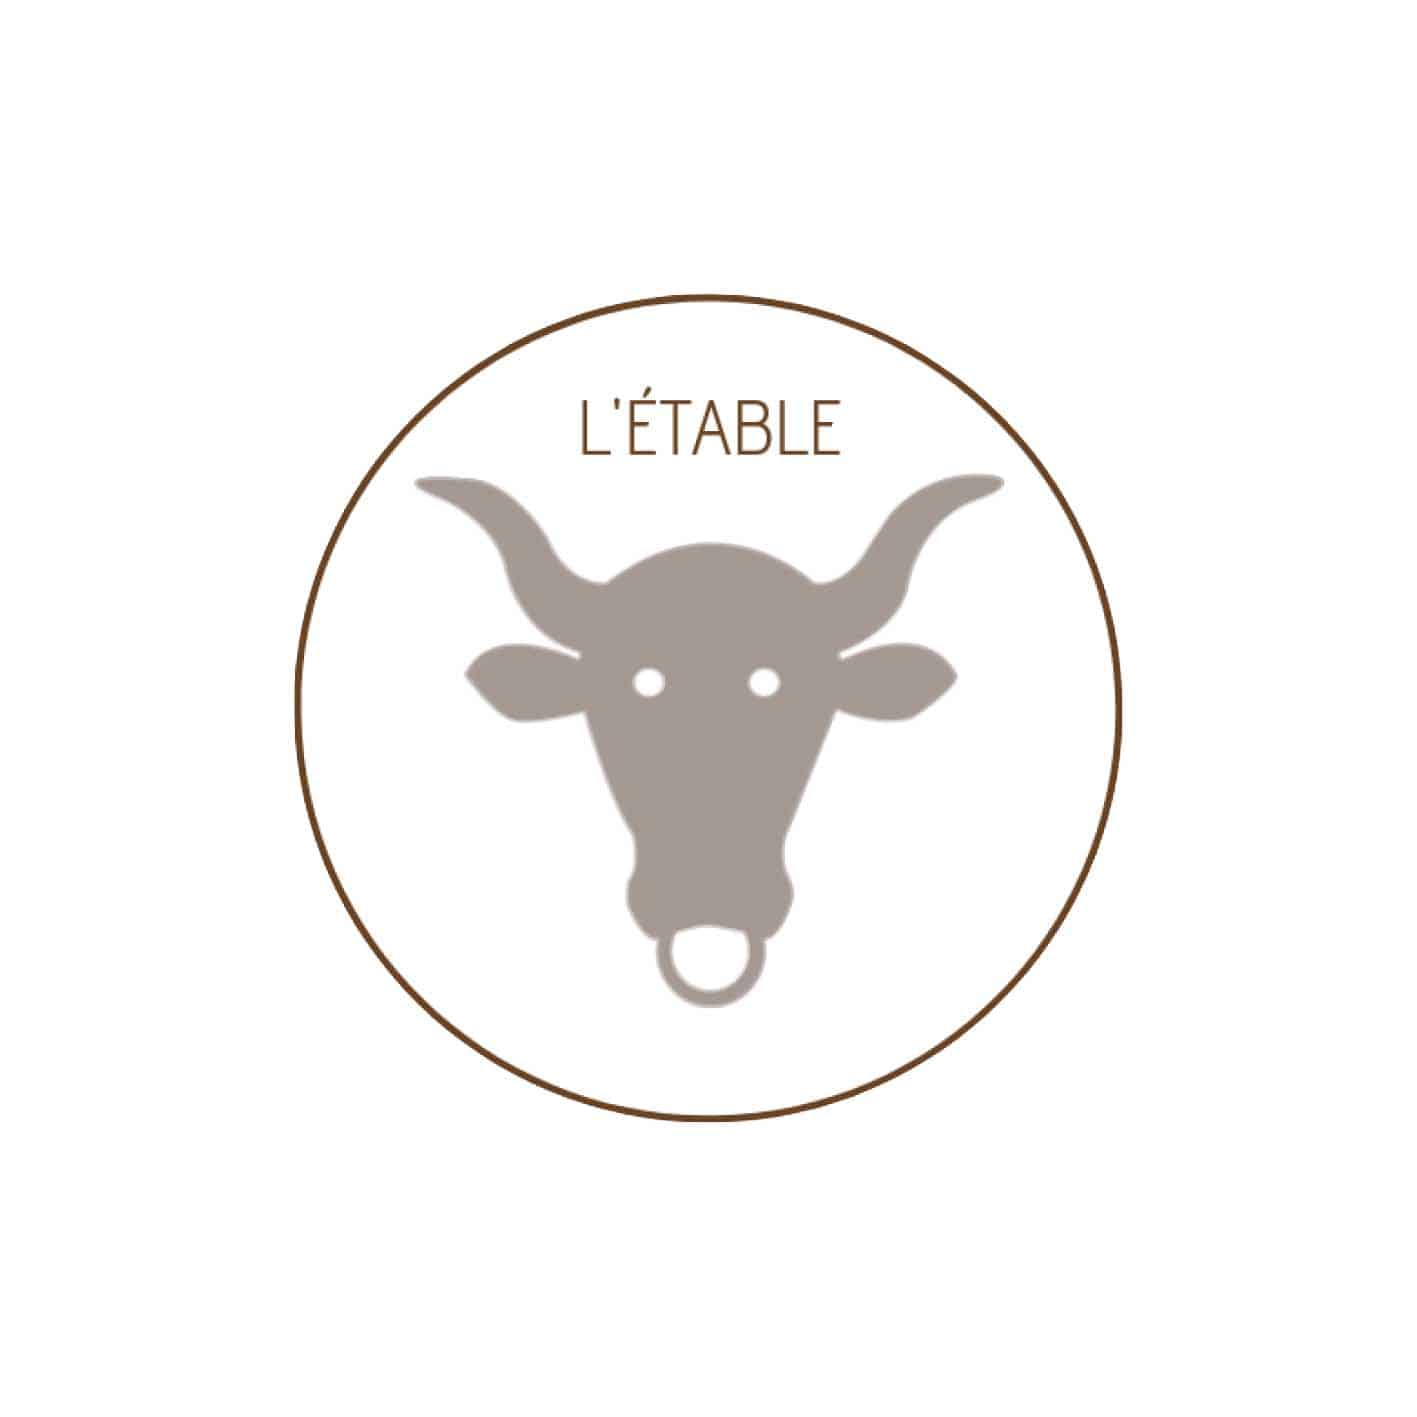 1964-communication-le-havre-logo-etable